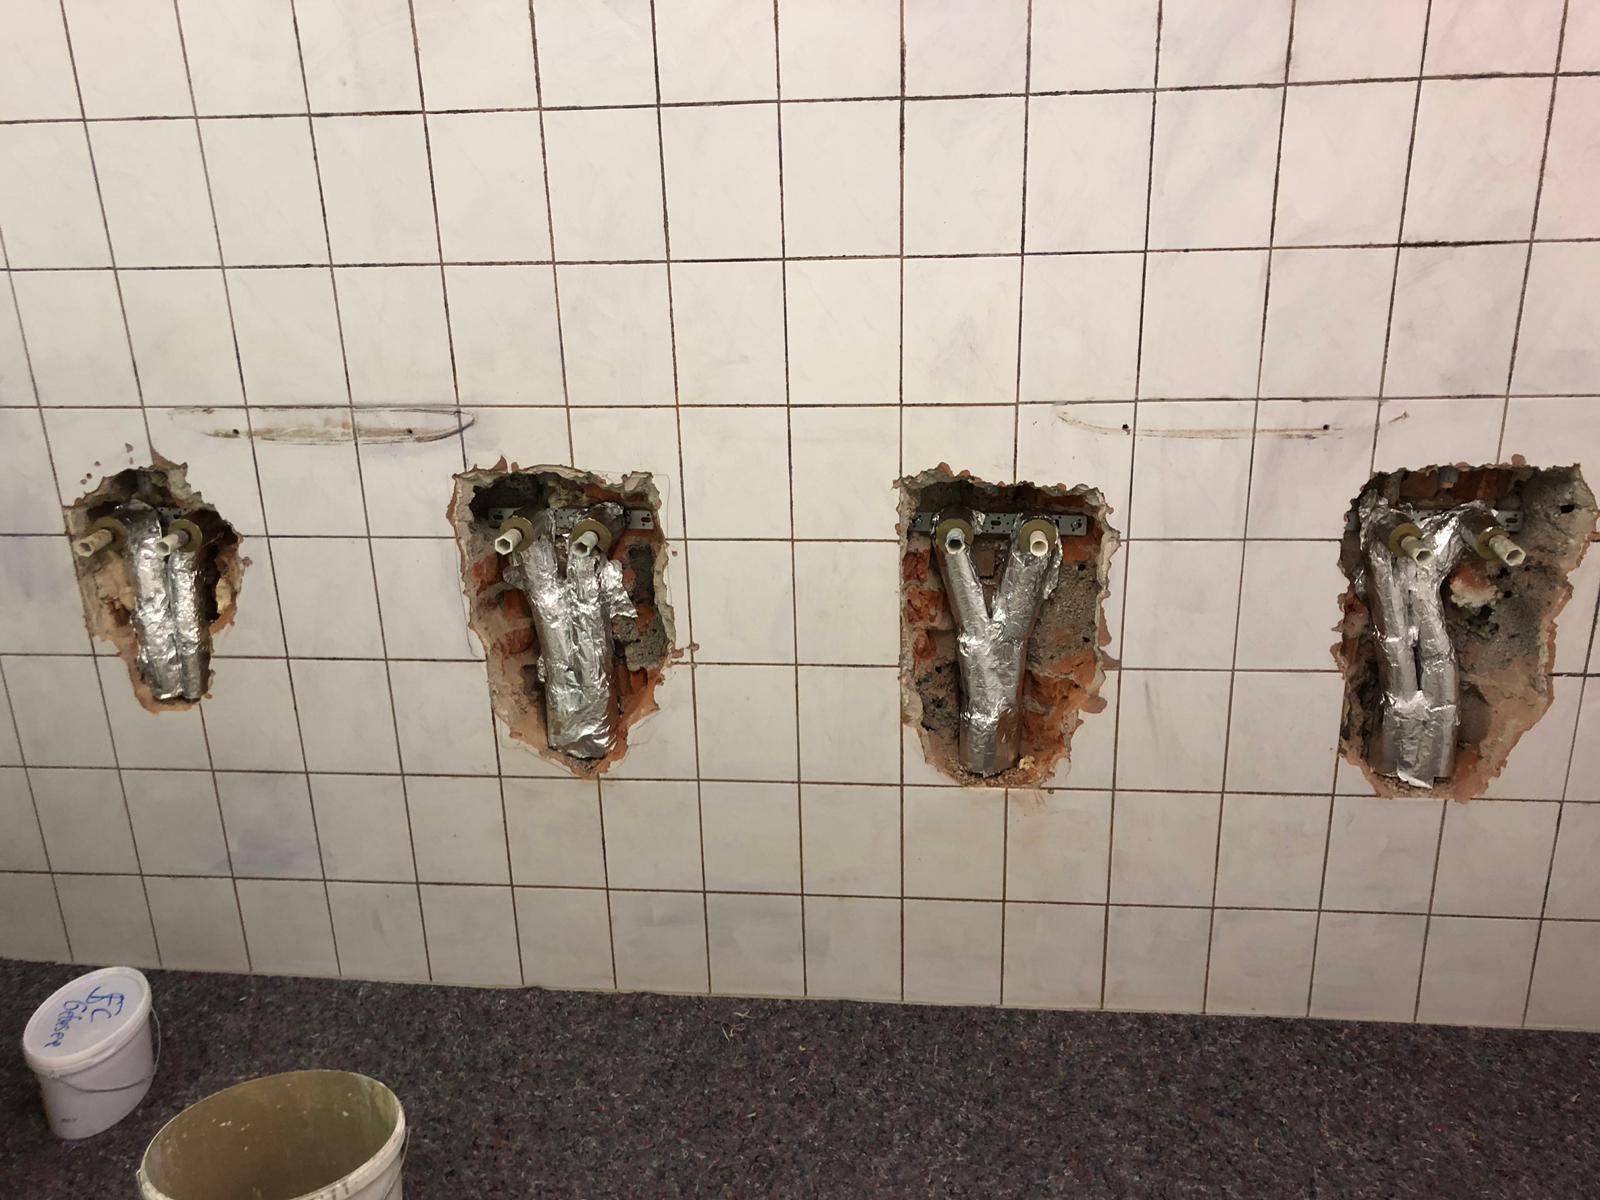 4 neue Duschplätze